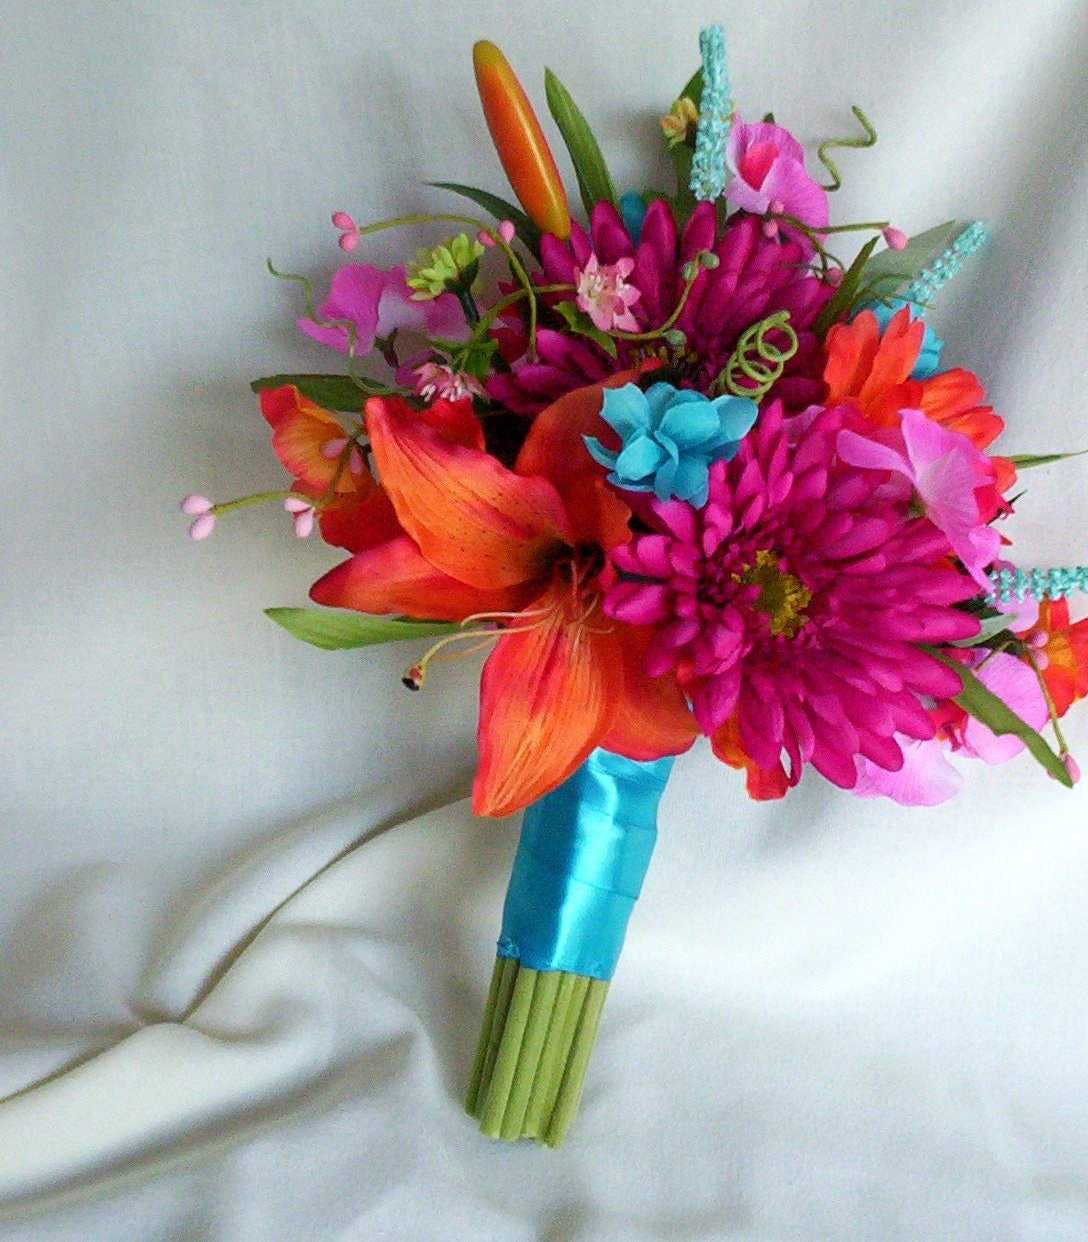 Beach Wedding Flowers: Wedding Accessories Beach Bouquet Malibu Blue Faux Flowers